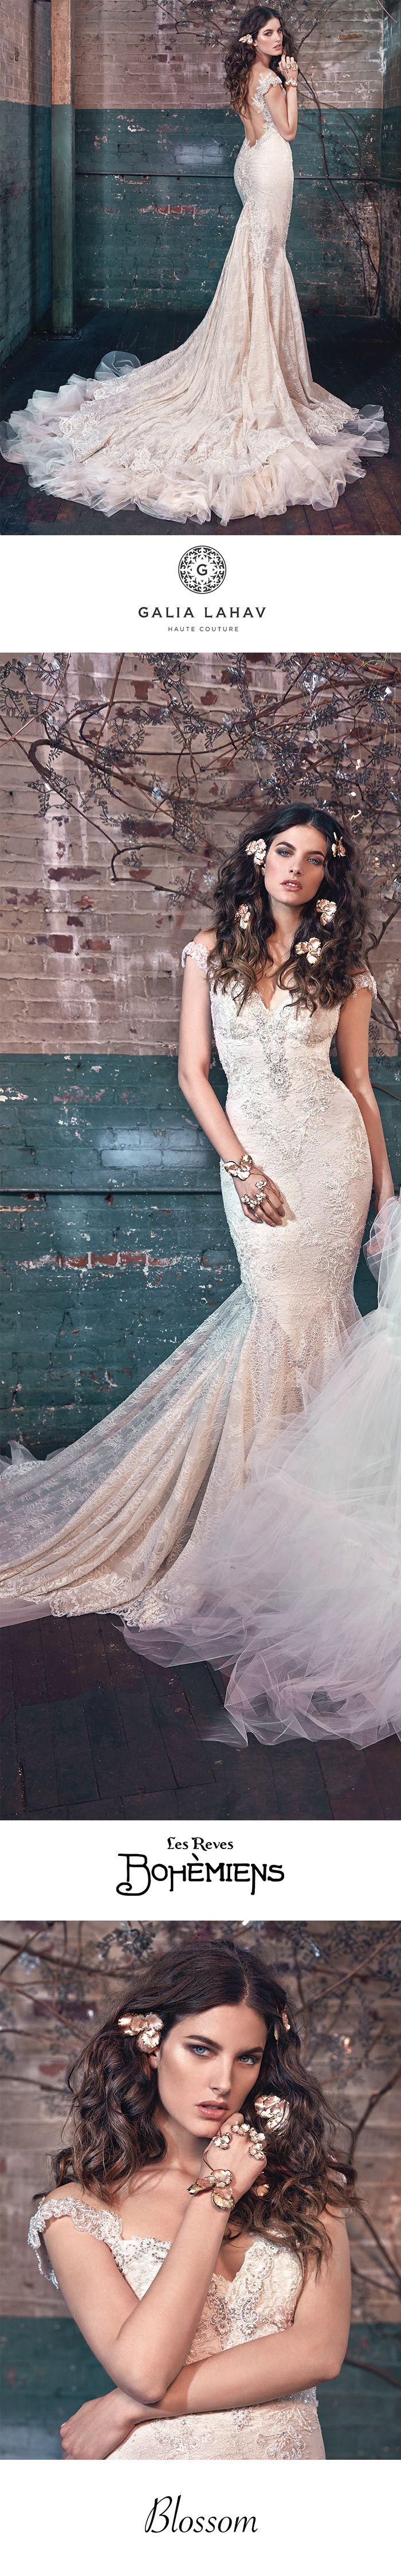 best wedding dress ideas images on pinterest